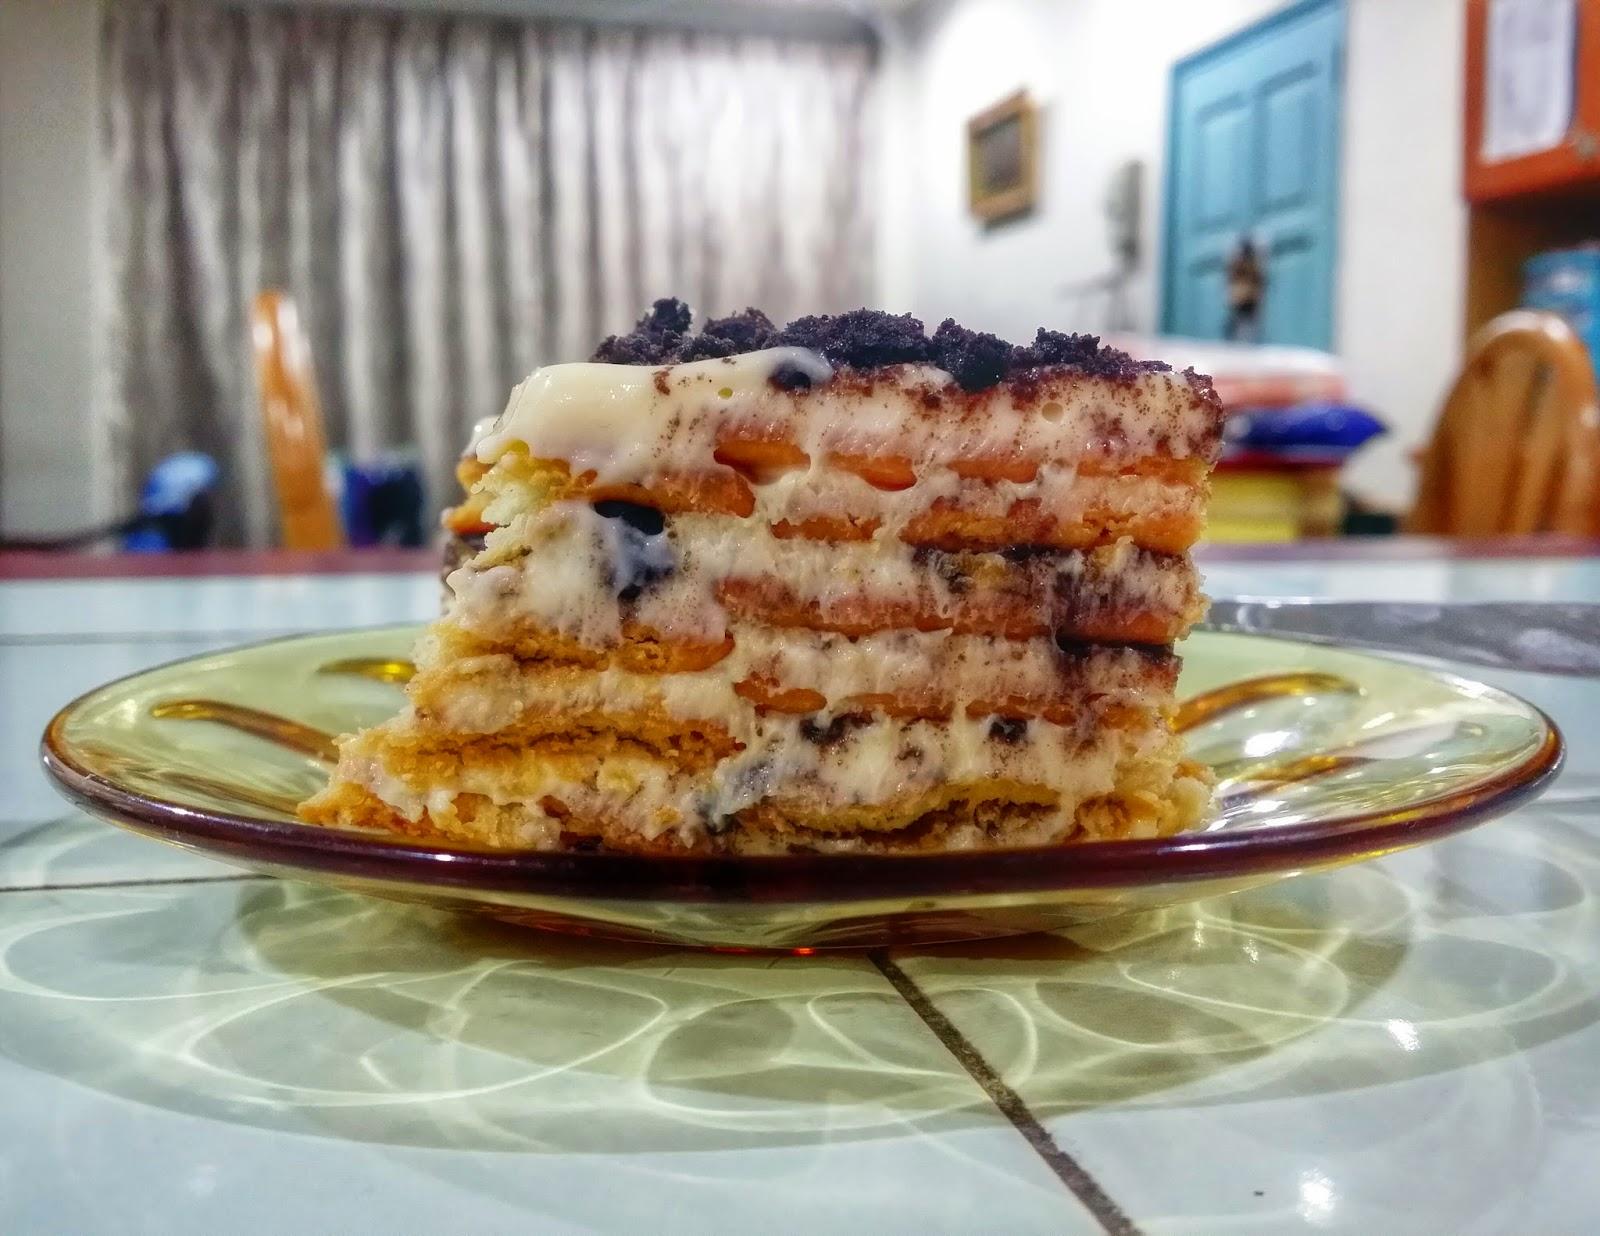 resepi pemanis mulut popular cheesekut oreo strawberry riang gembira cahaya  riang Resepi Kek Batik Strawberry Enak dan Mudah